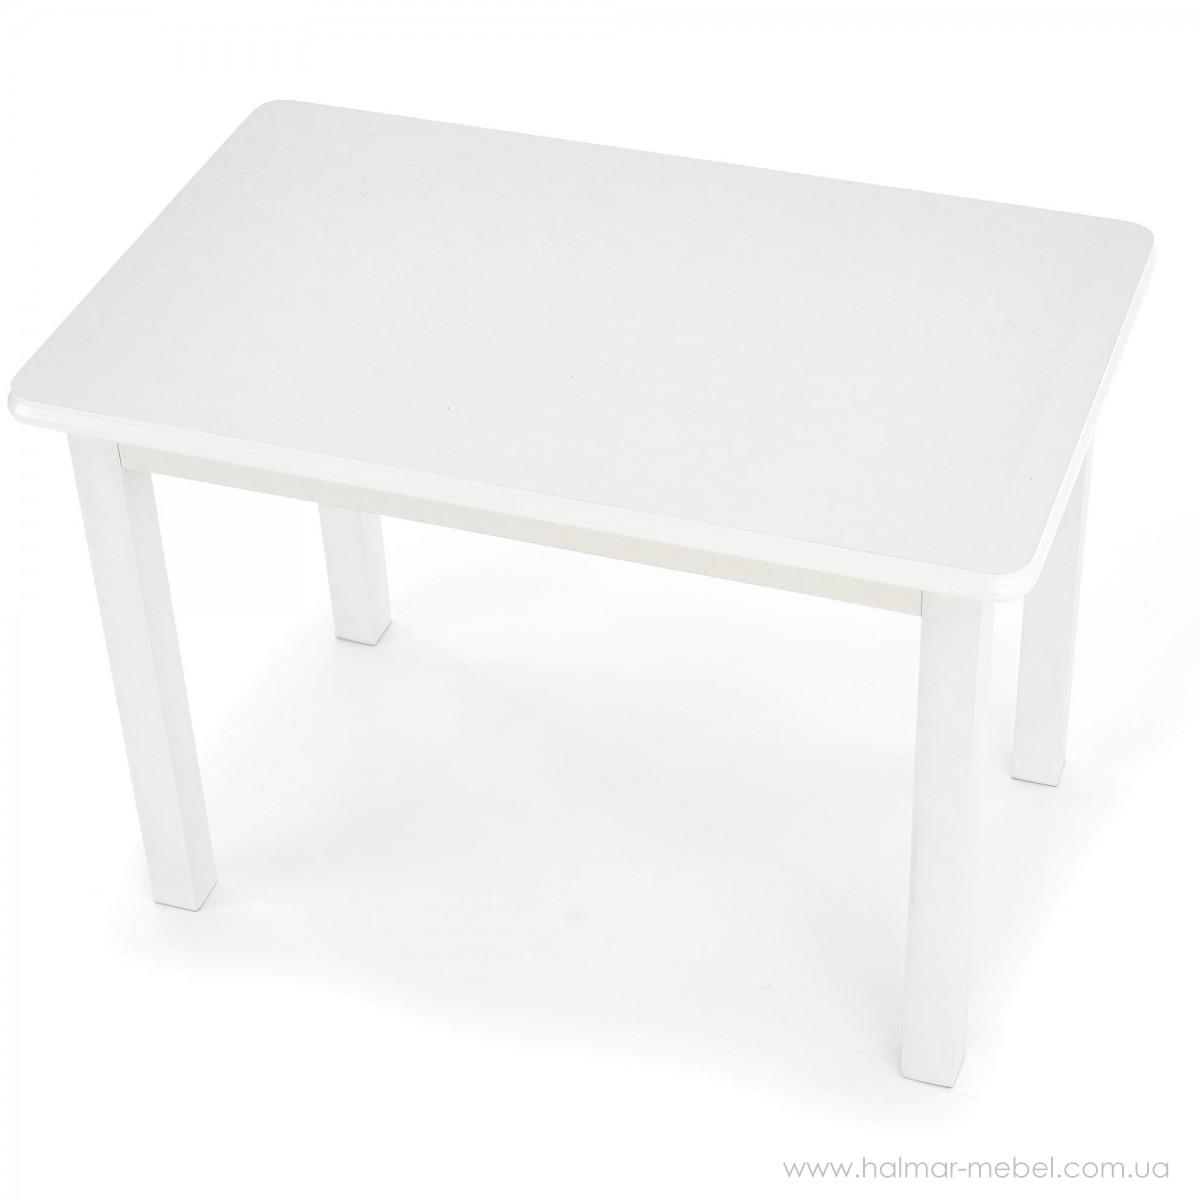 Стол обеденный DINNER 120/158 HALMAR белый